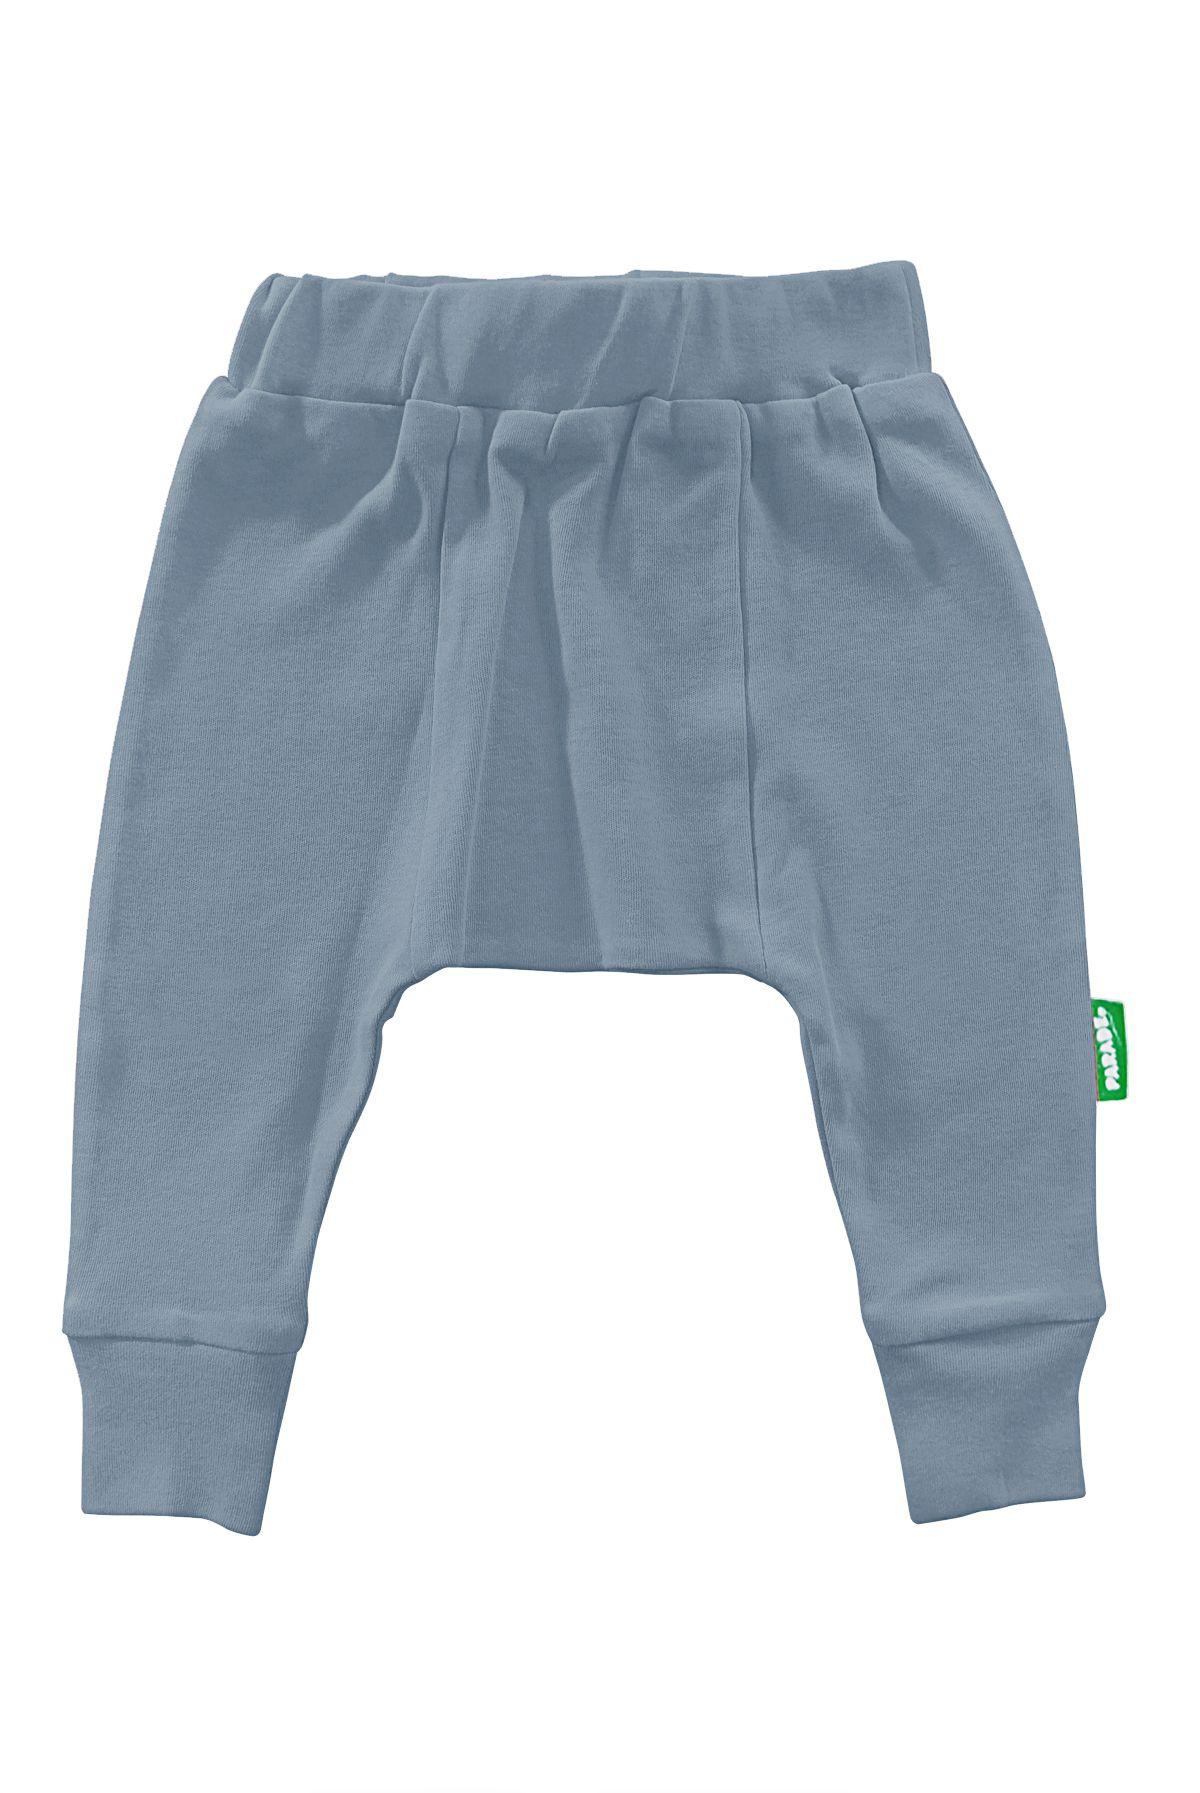 Parade Harem Pants Essentials